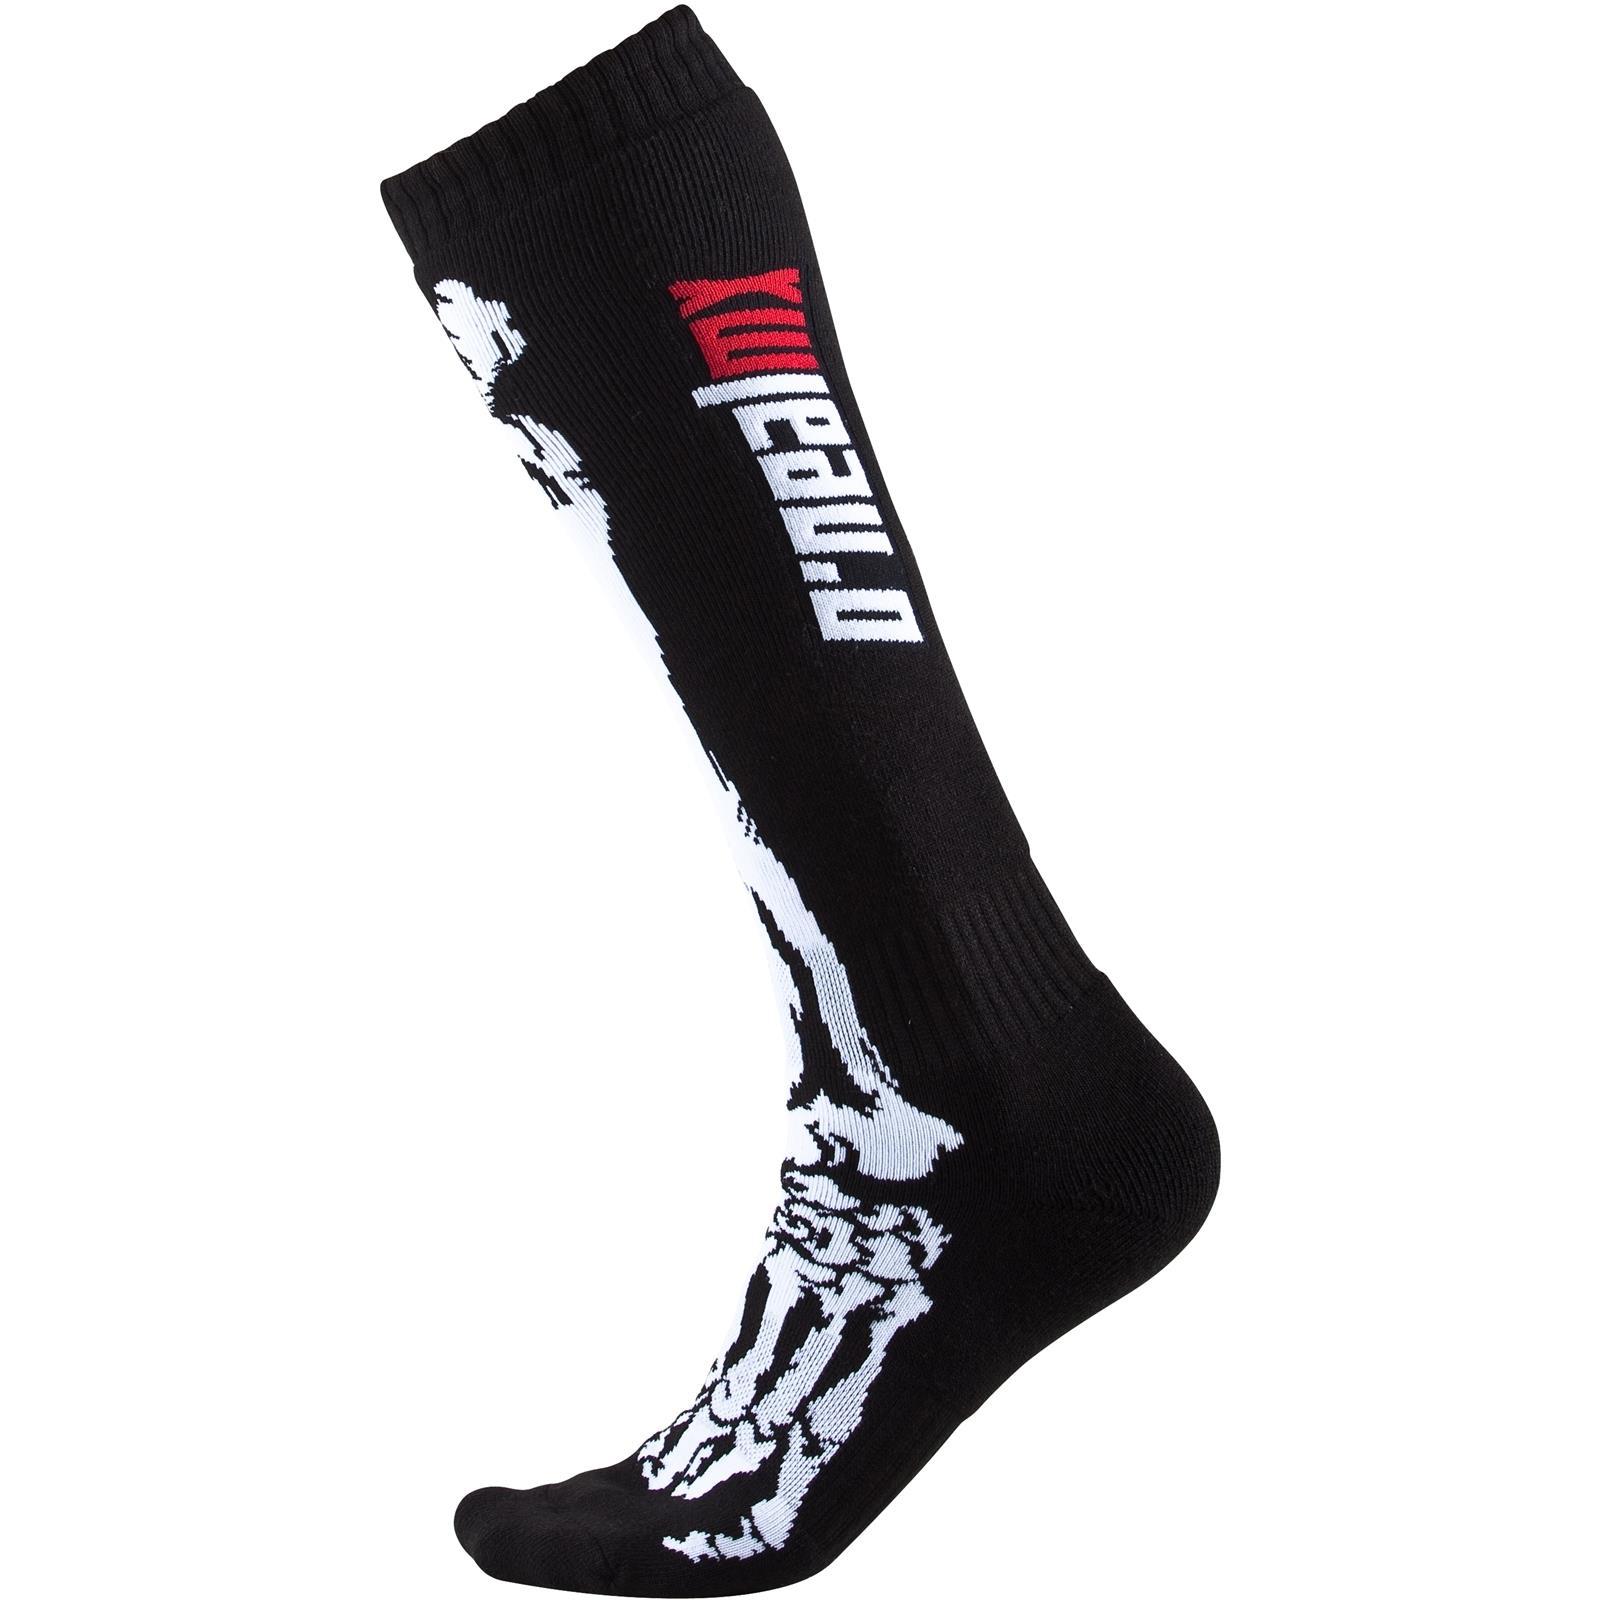 ONEAL-MOTO-CROSS-Calze-Moto-Enduro-MX-MTB-ATV-Quad-Calze-Sock-BICICLETTA-FR miniatura 58